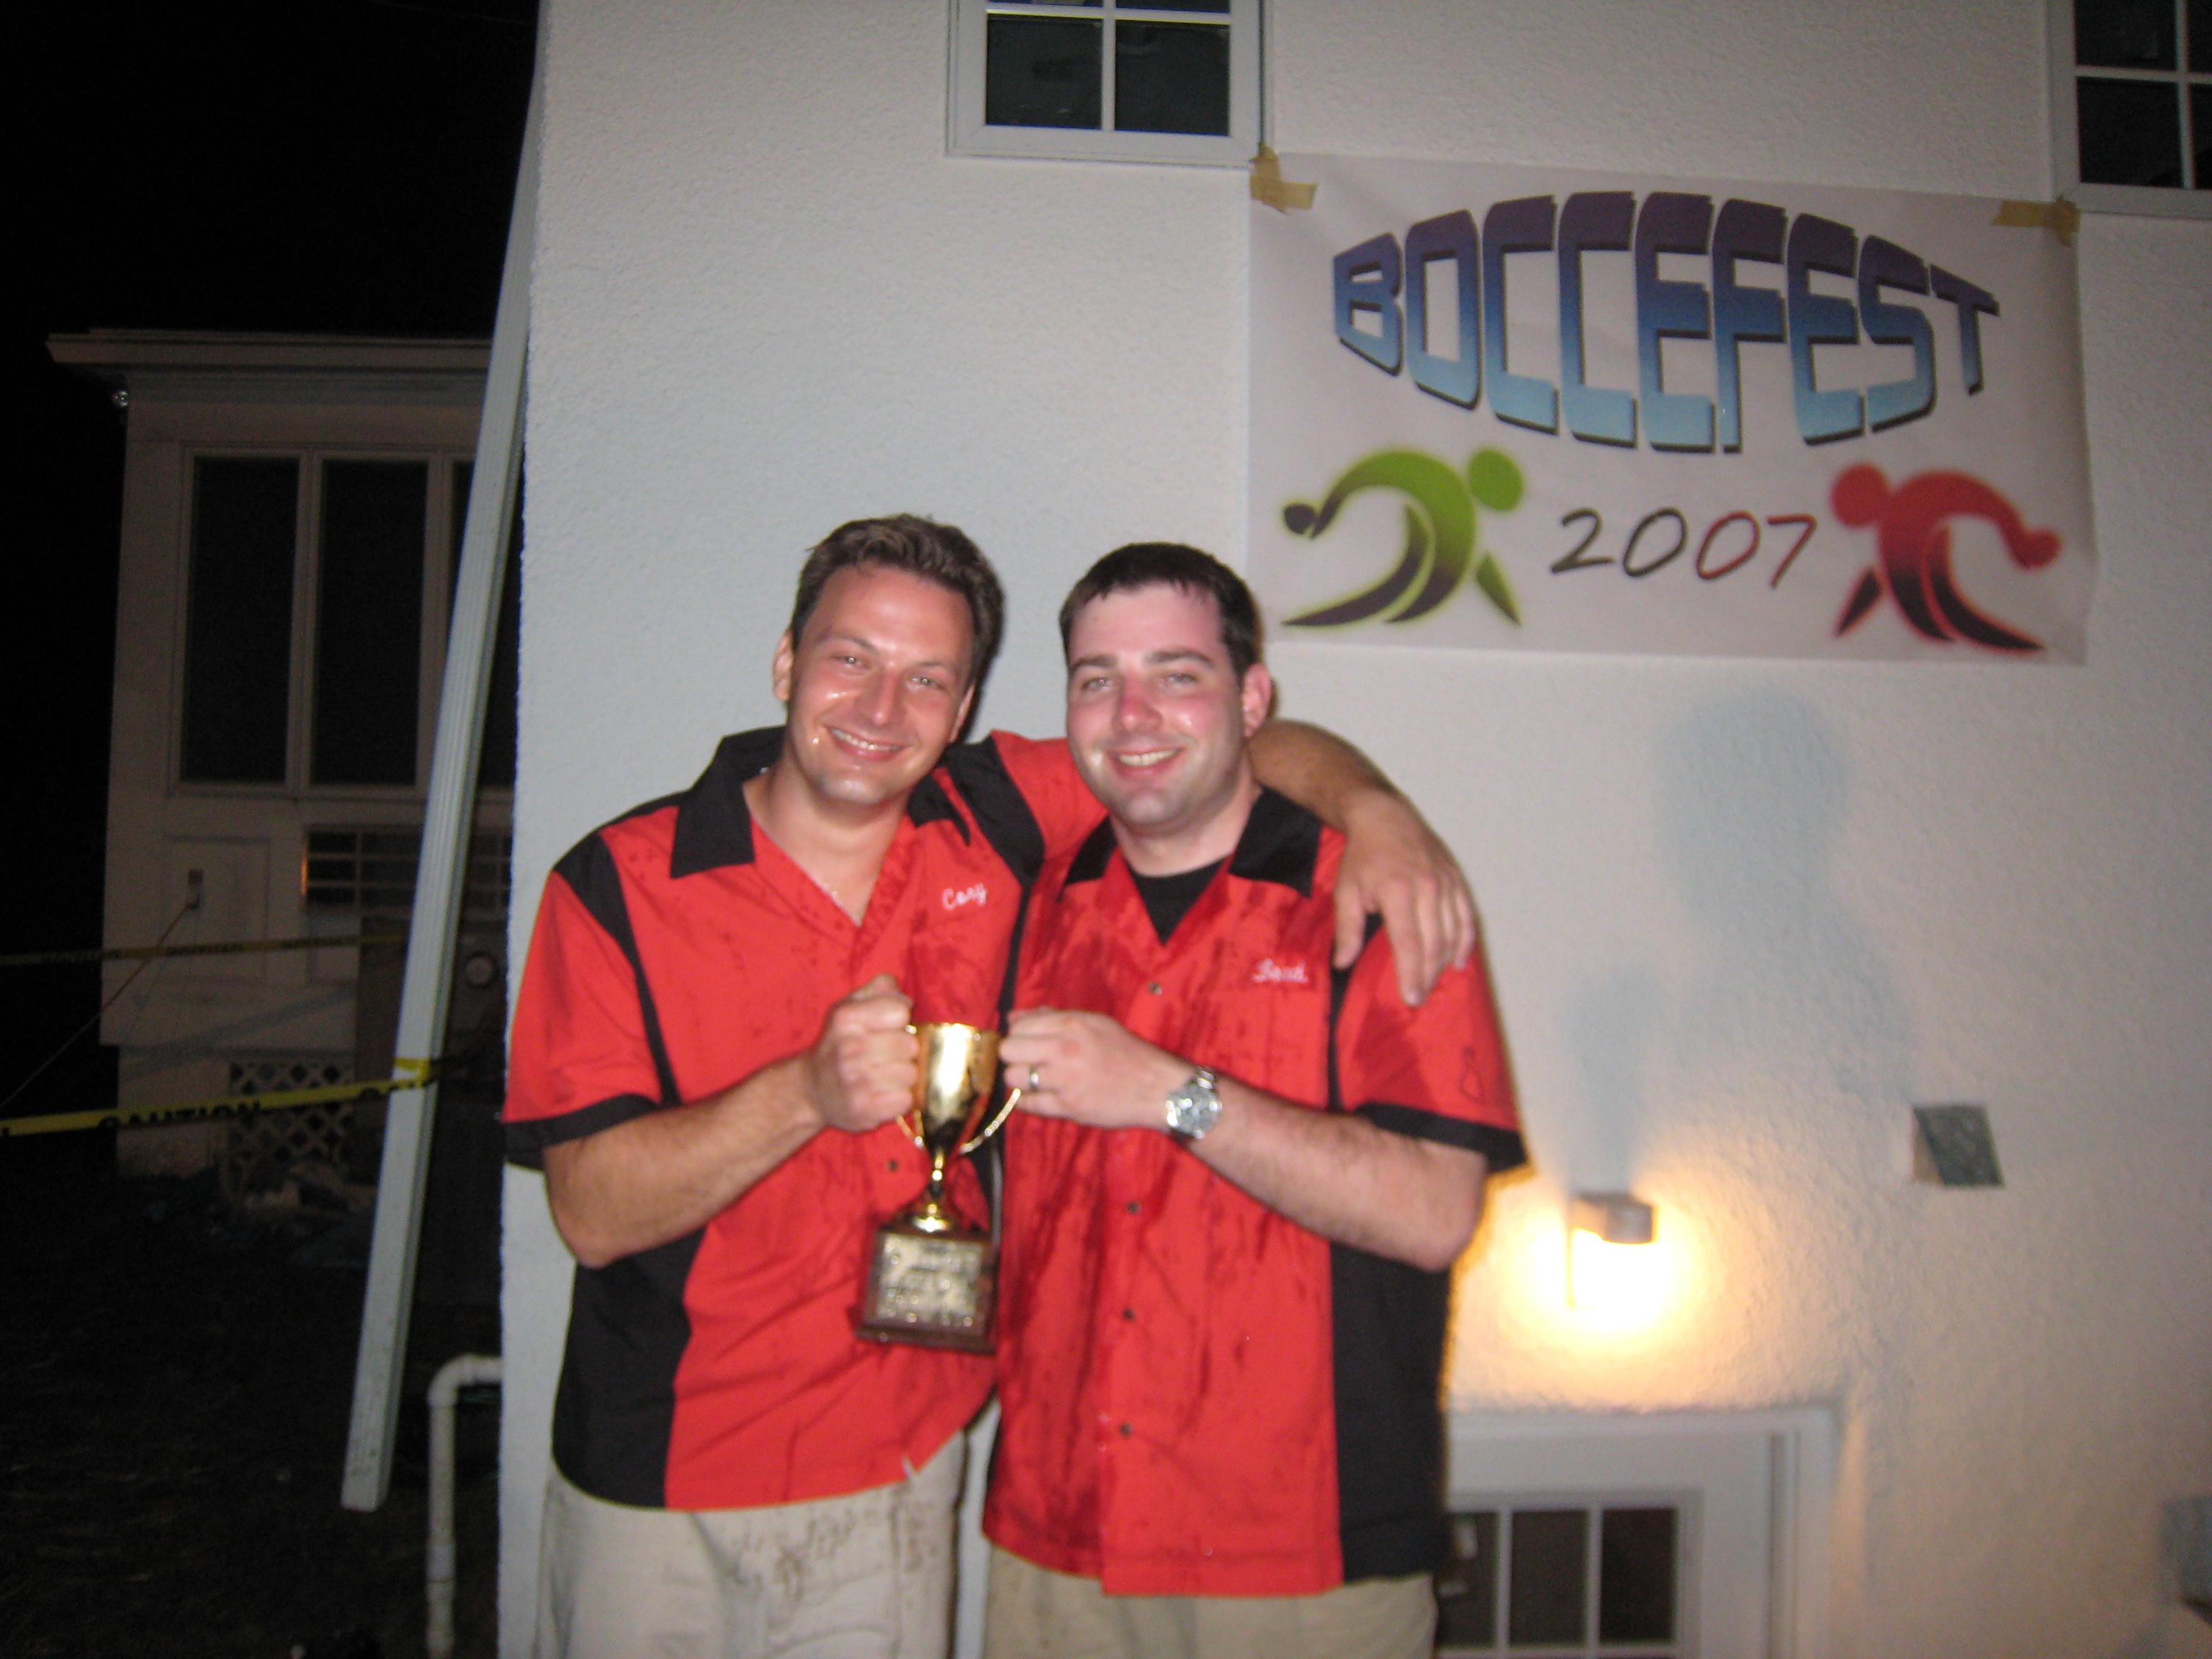 2007 BocceFest Champions